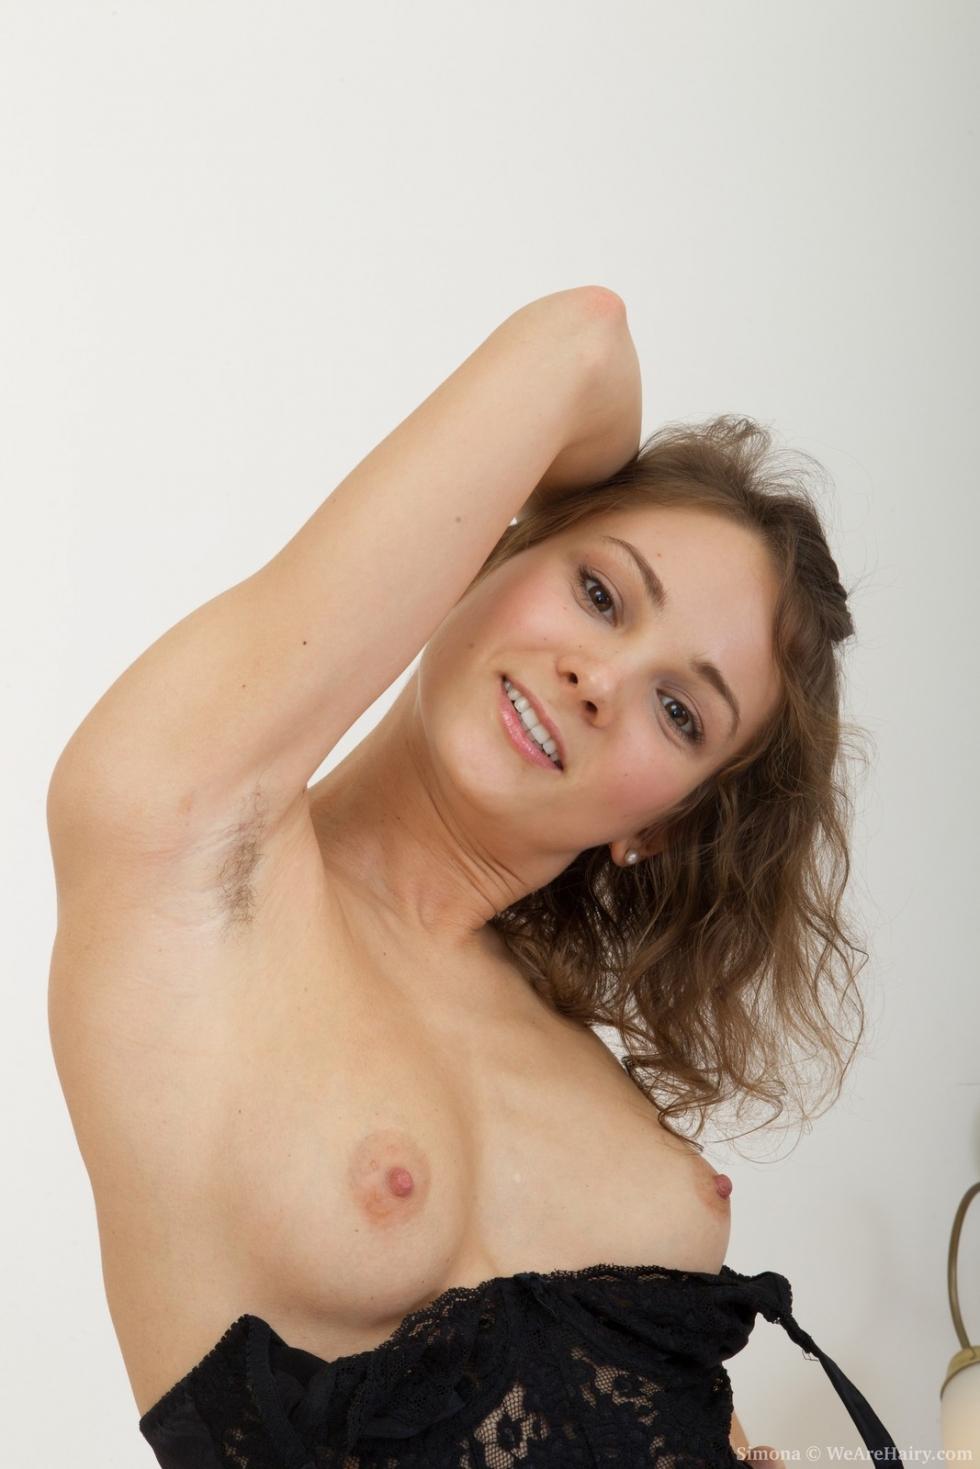 imgsrc boys and girls nudity